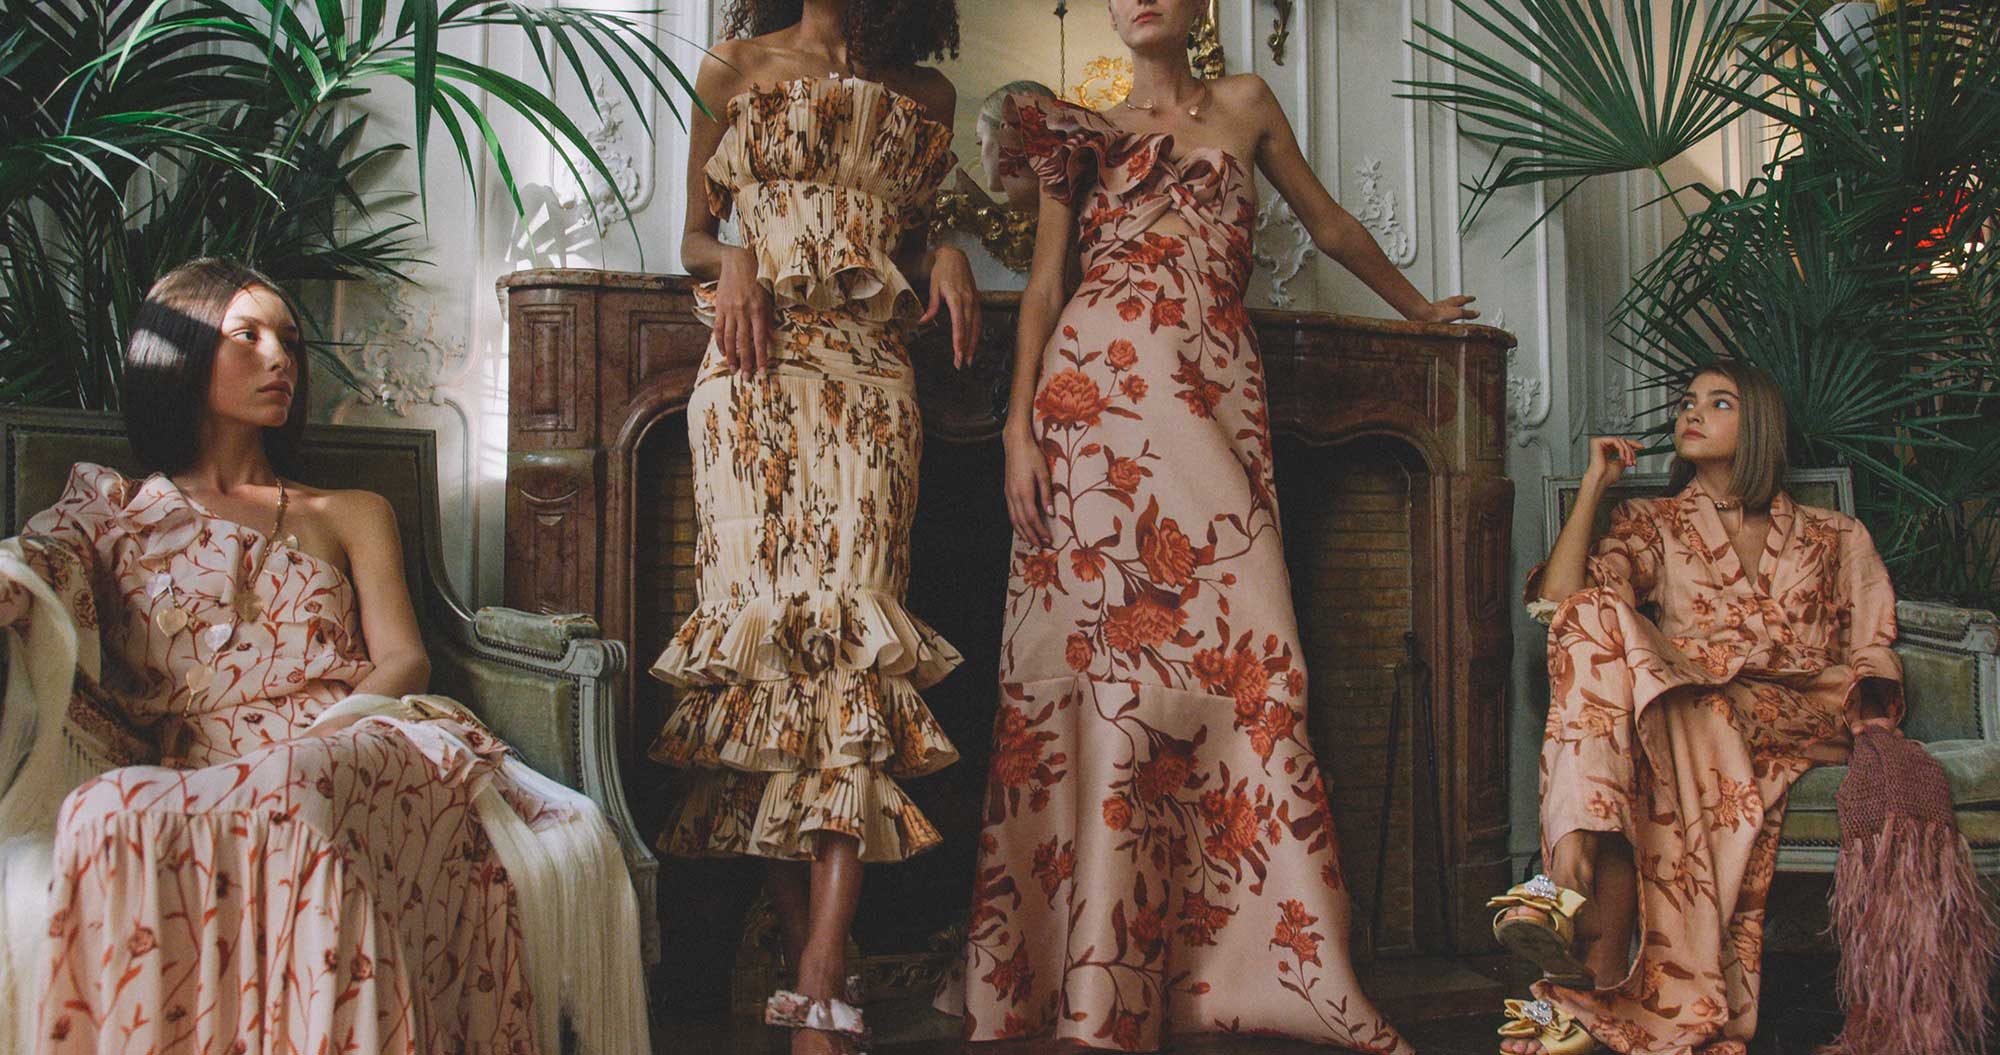 Johanna Ortiz Spring Summer 2019 Presentation Paris Fashion Week34.jpg